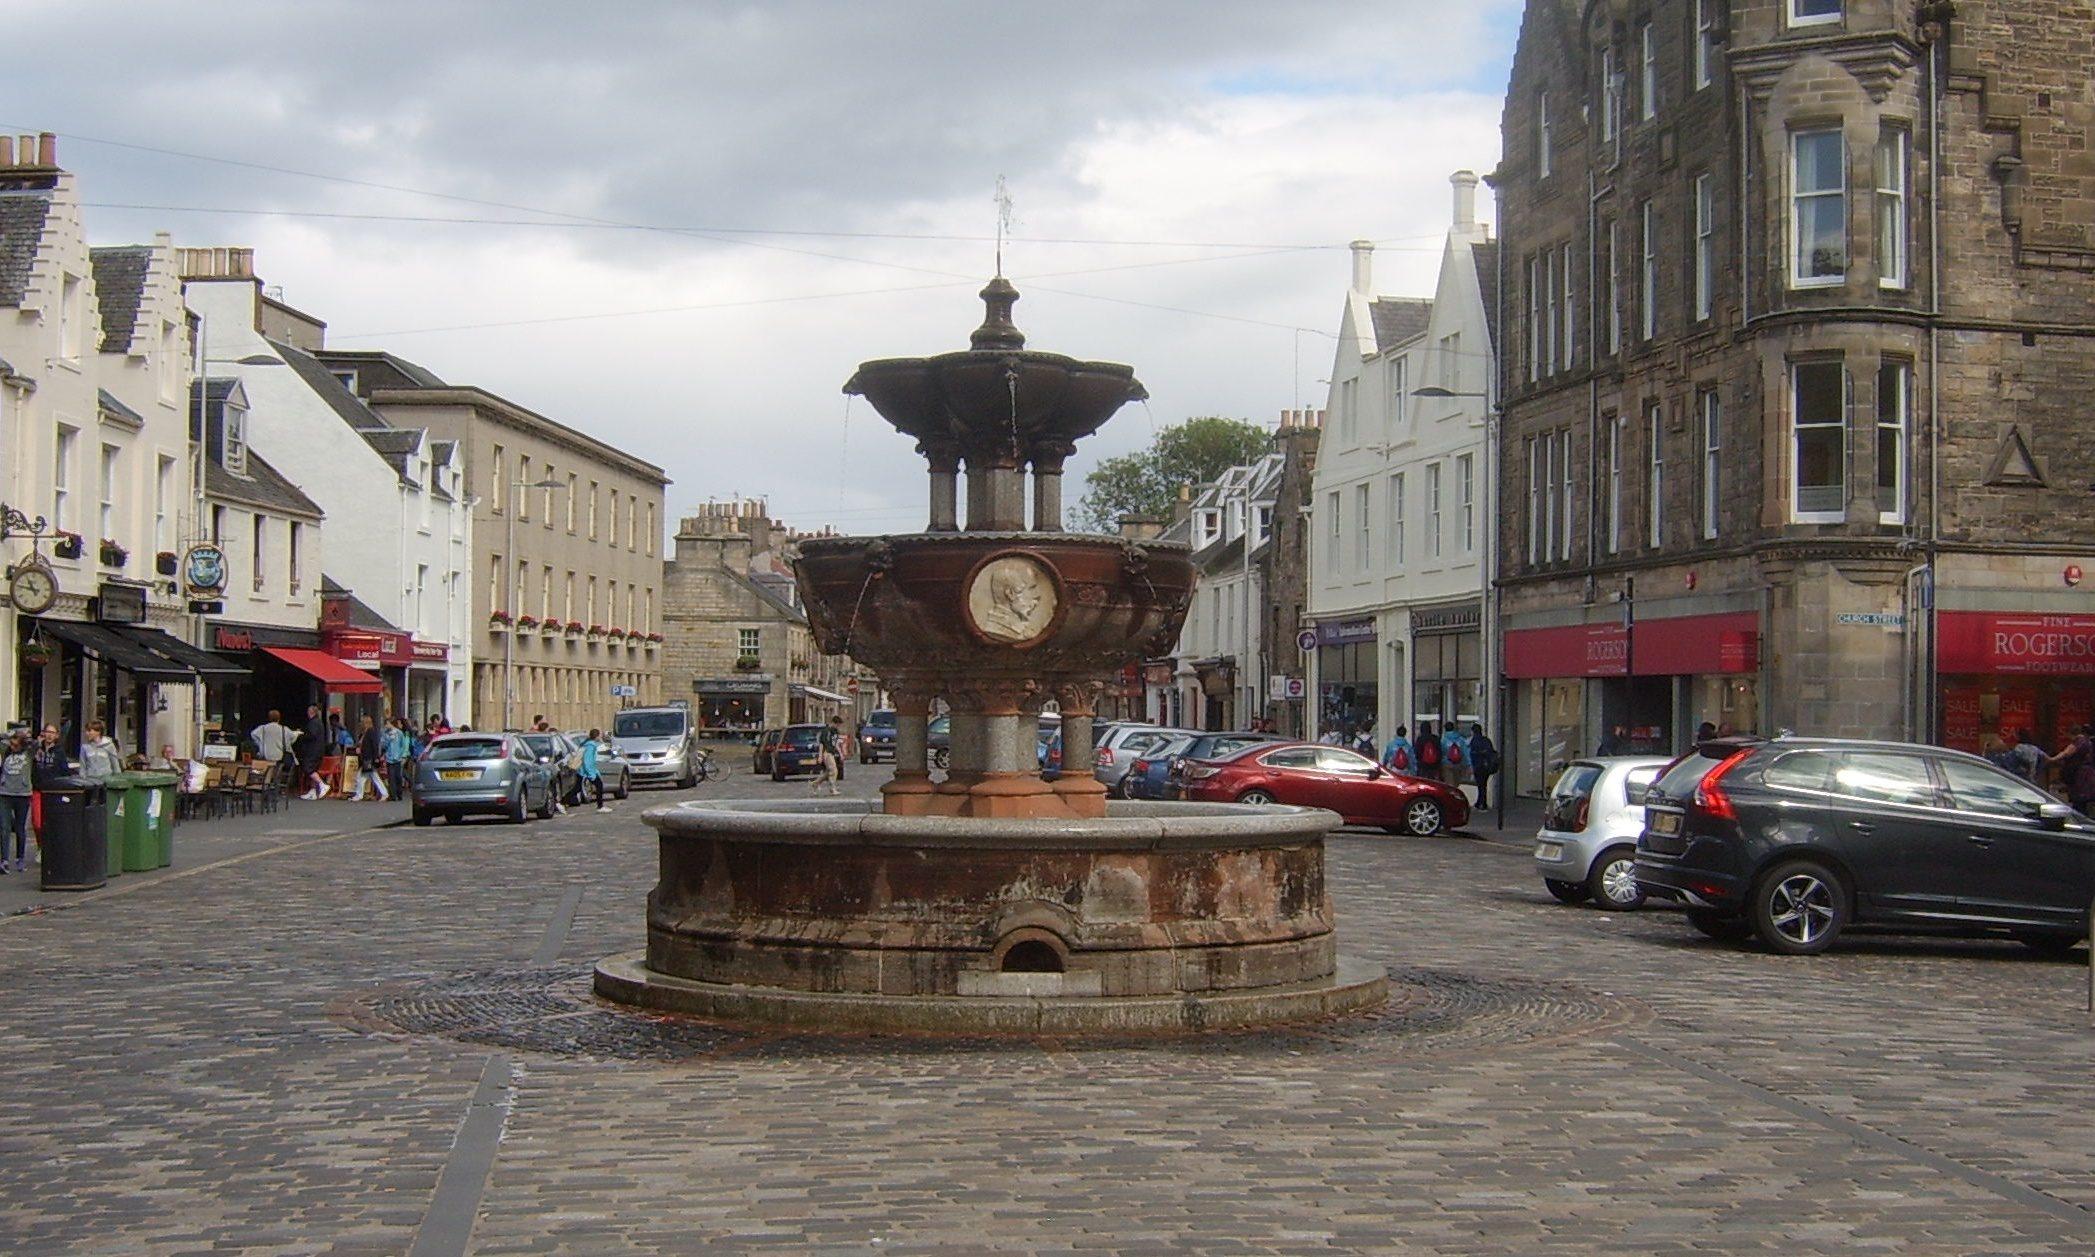 Whyte-Melville Memorial Fountain, St Andrews, Fife.